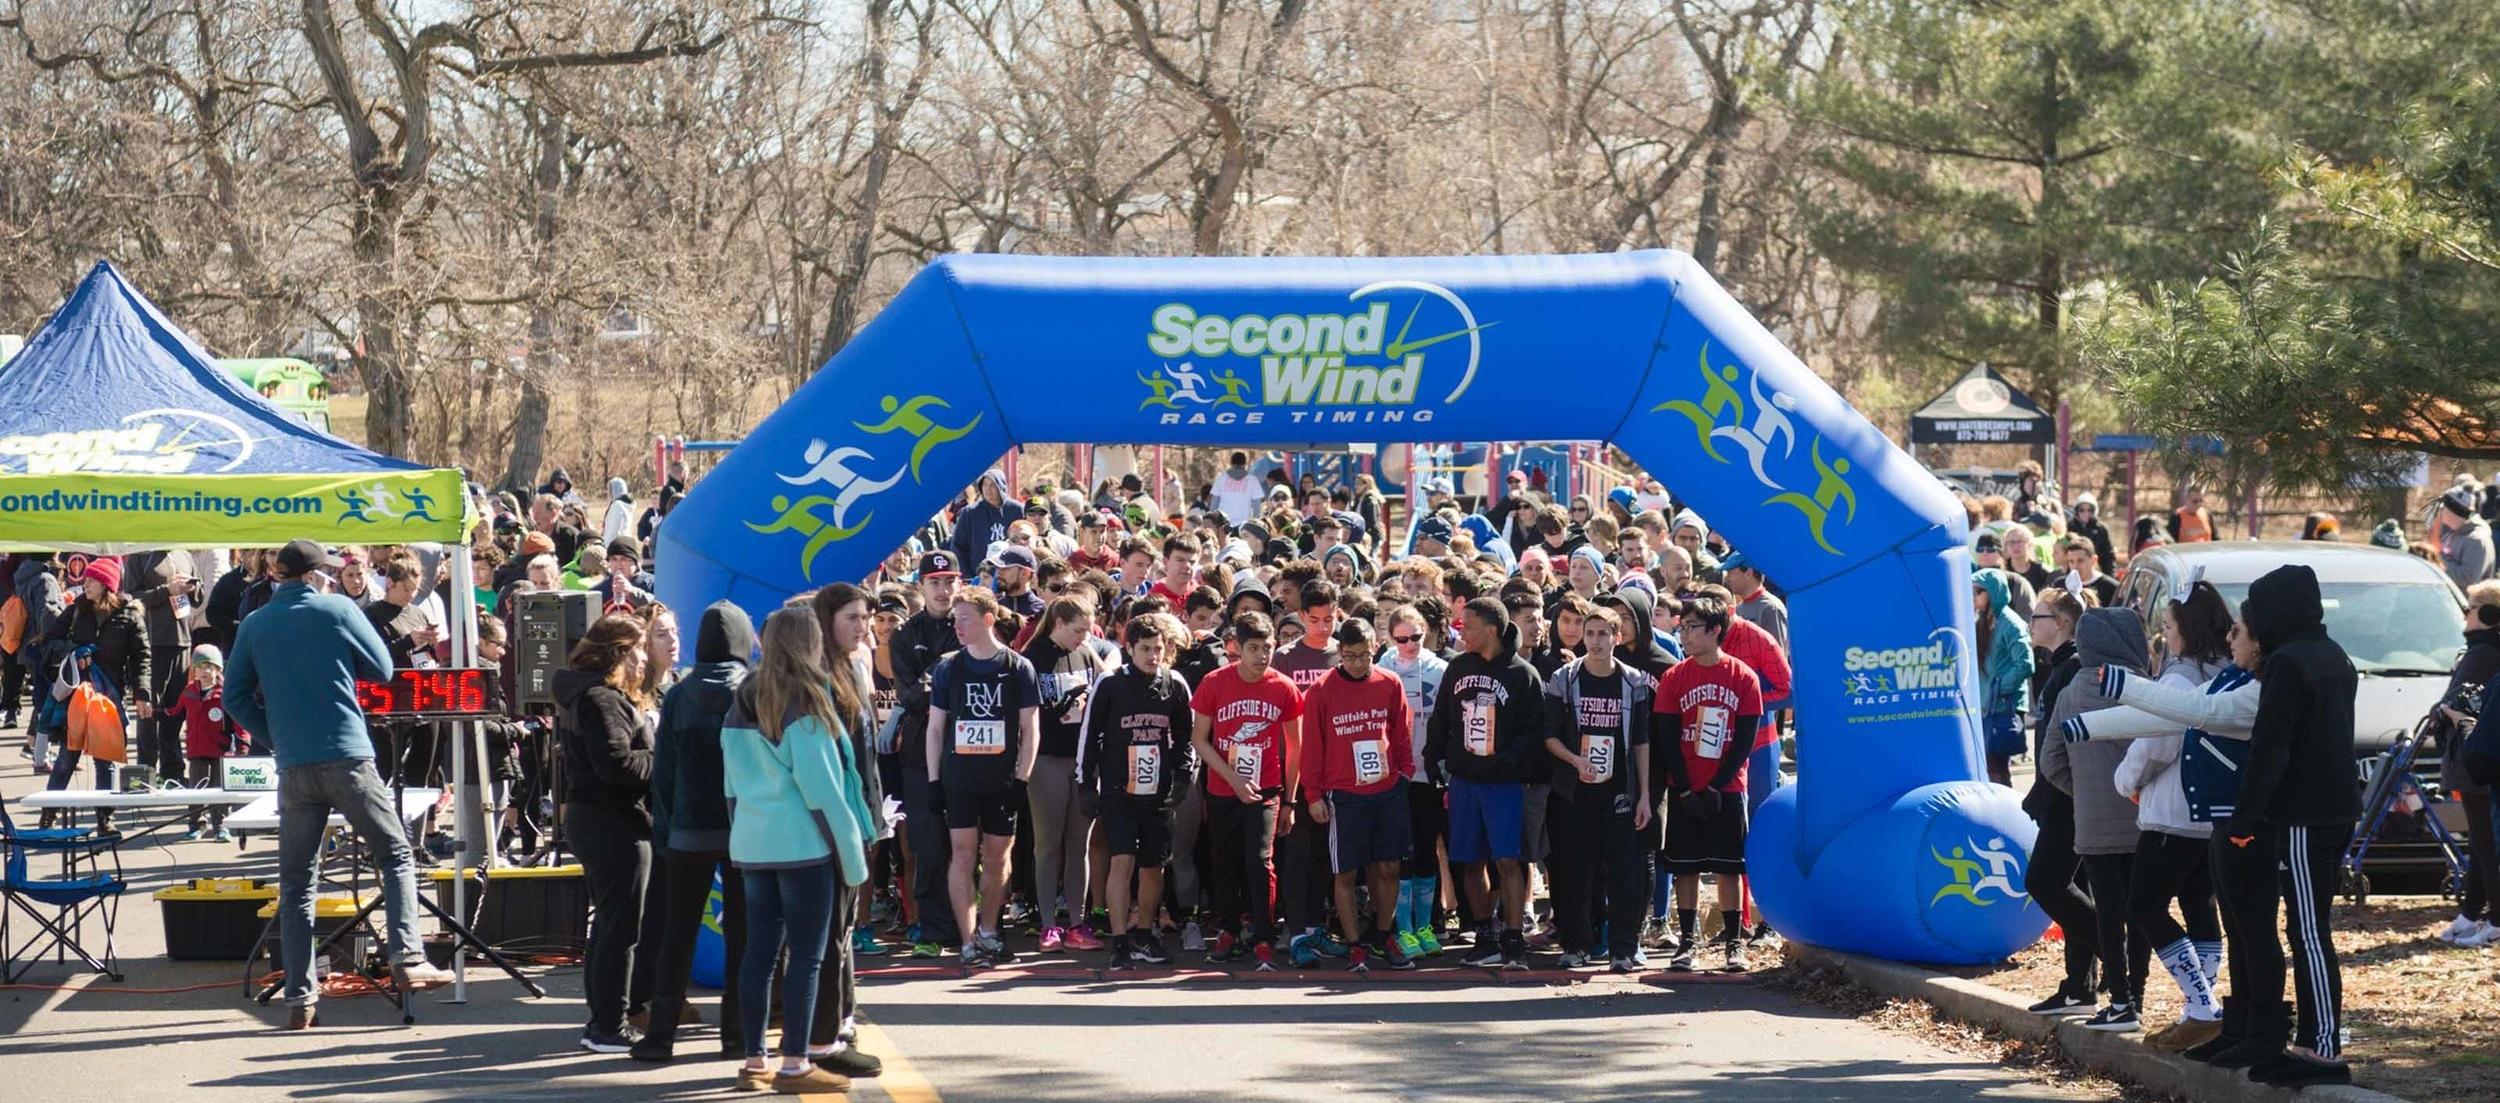 2018-03-24 Haydens Heart 5k - Riverside County Park - Lyndhurst NJ-121.jpg